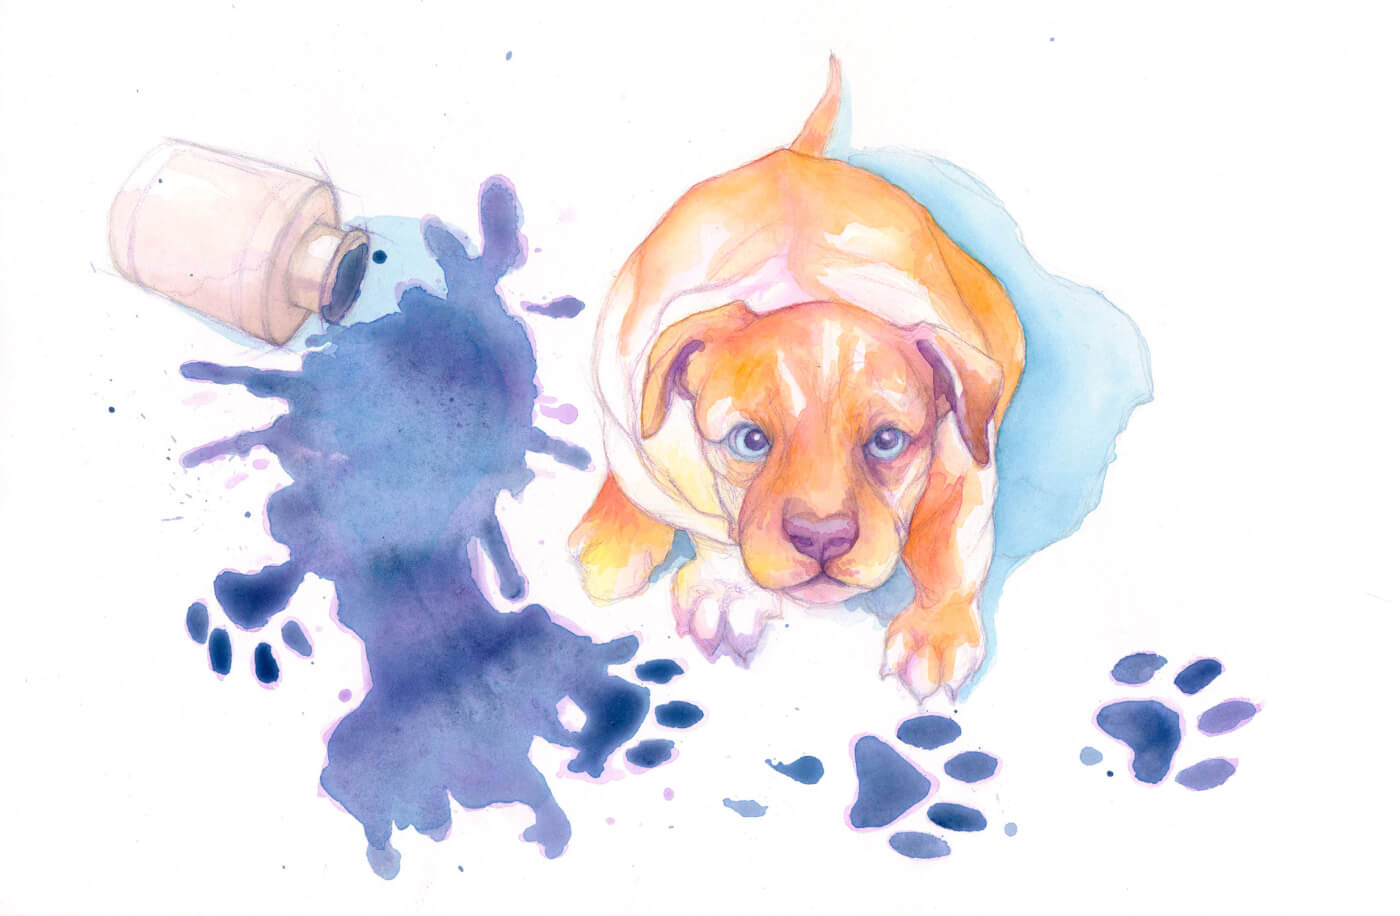 Hunde, Hundebabys, Illustration